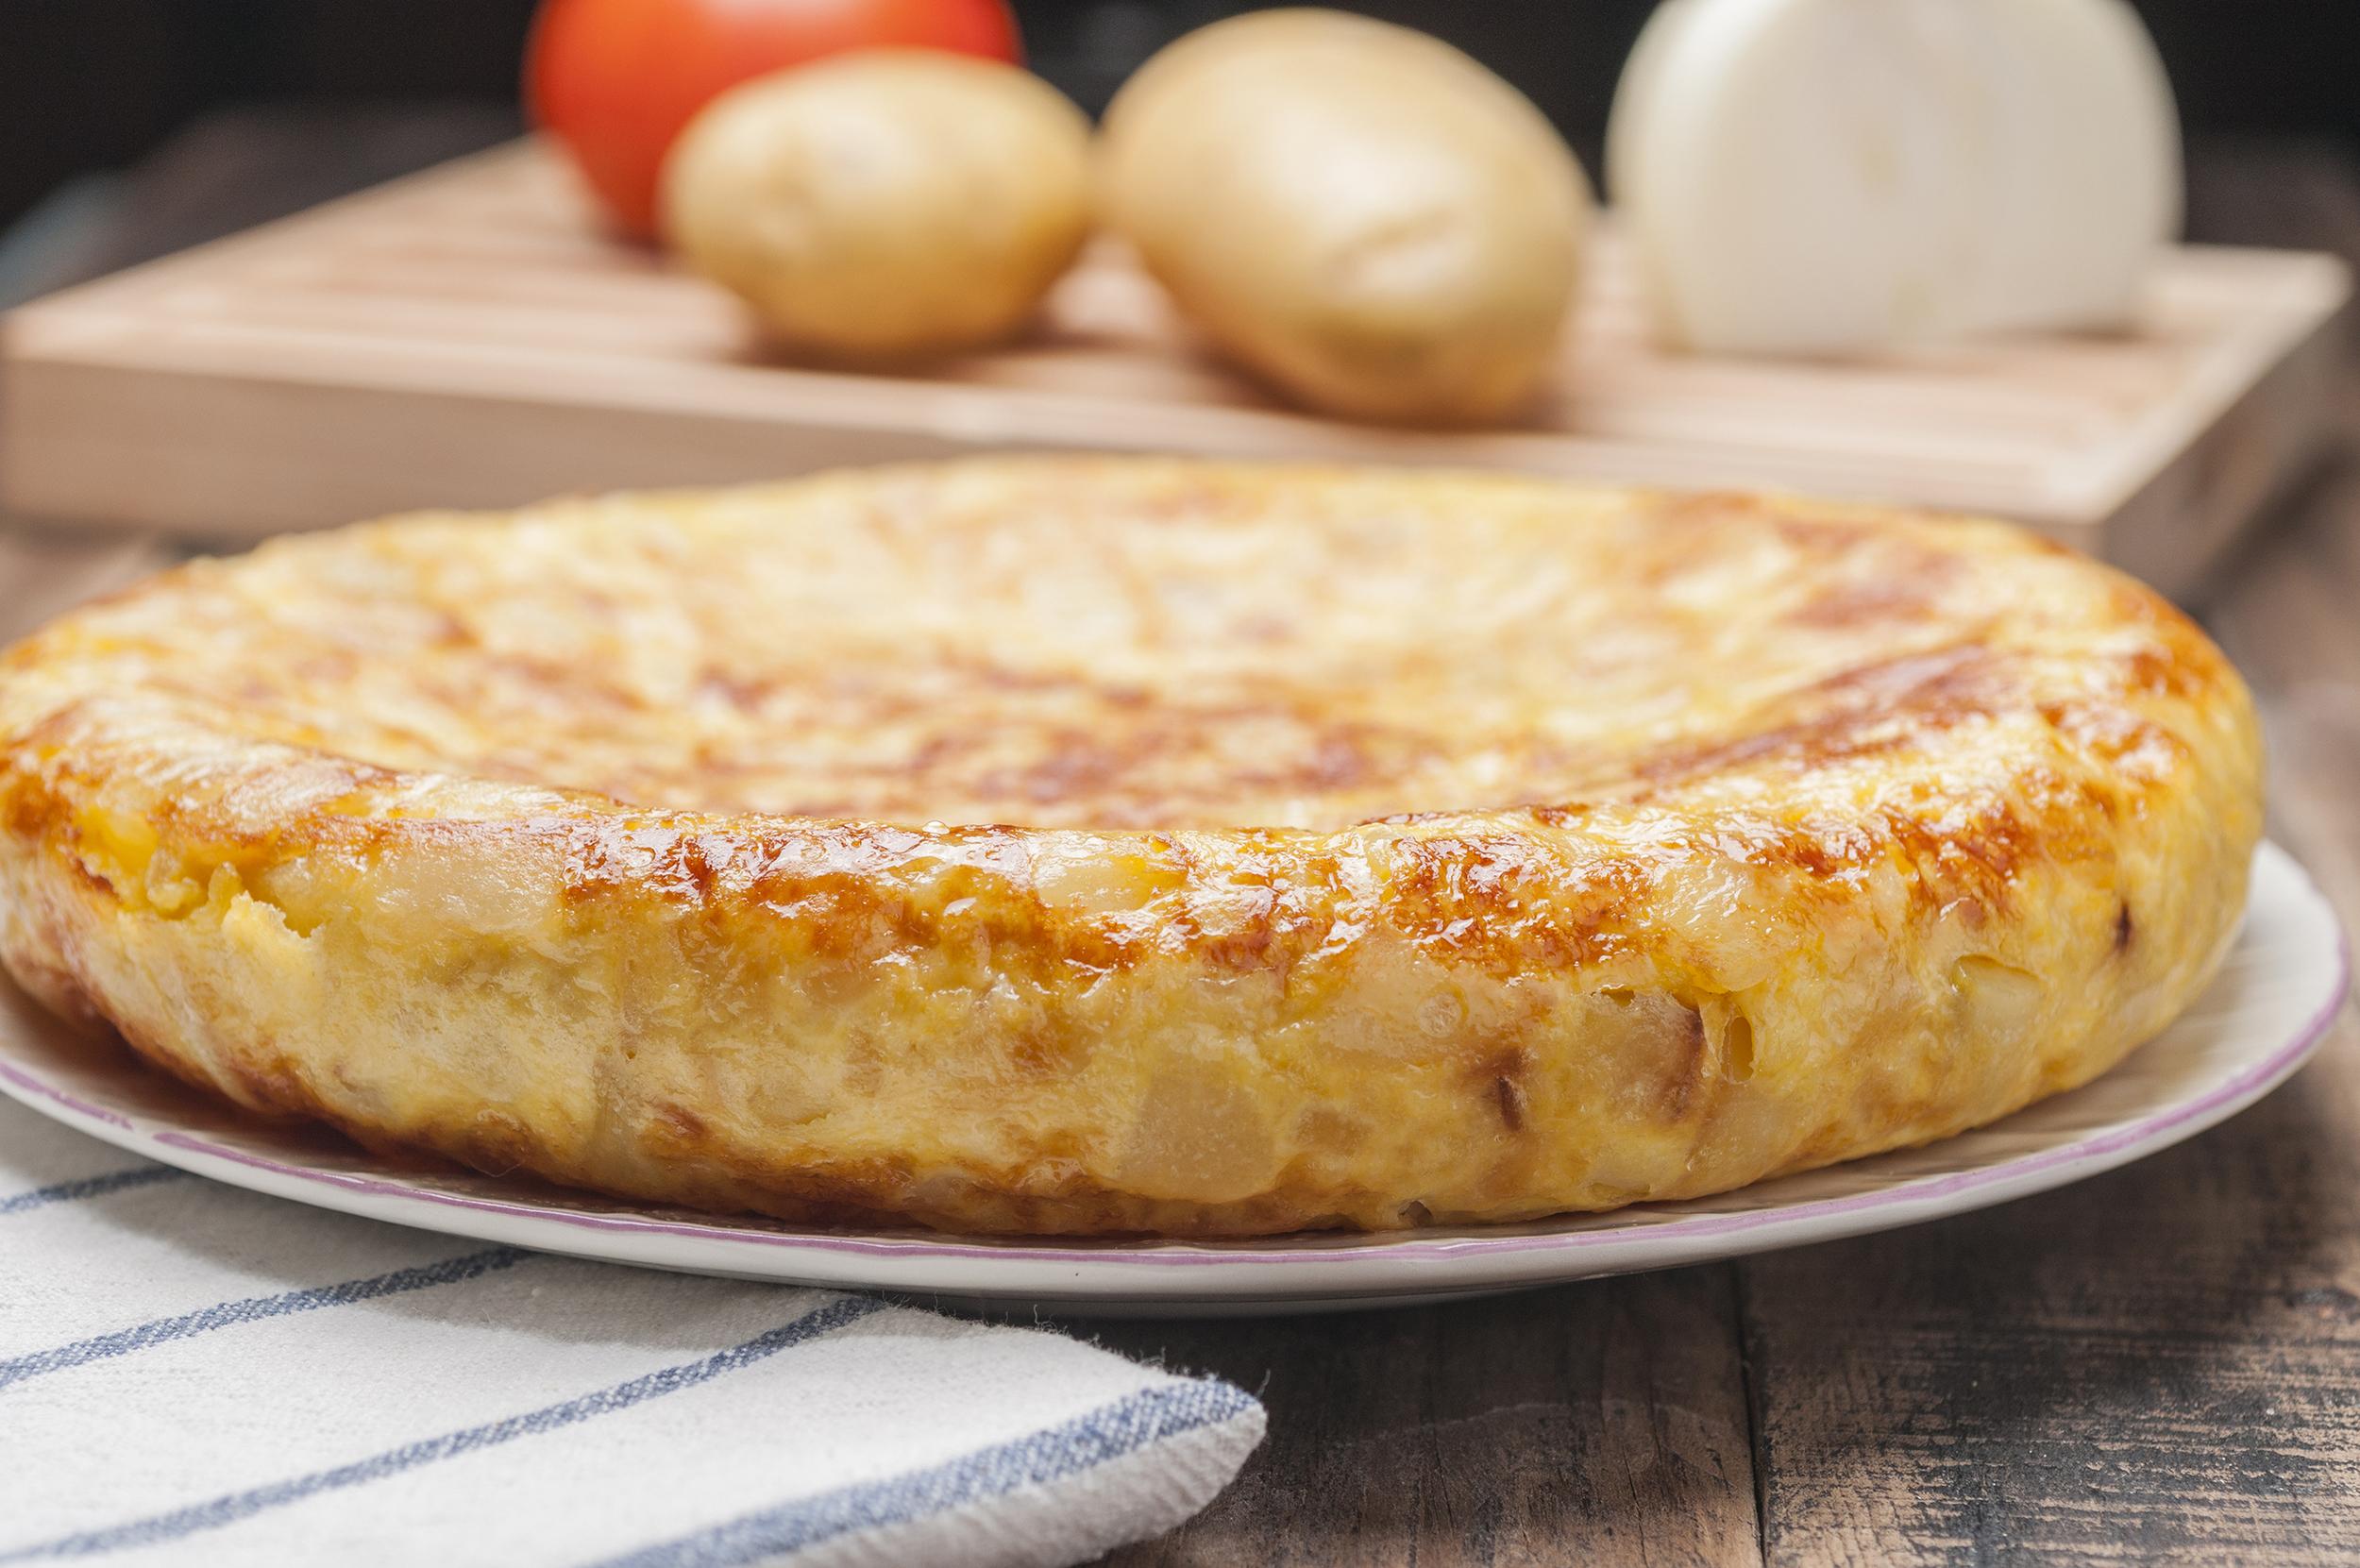 02 Tortilla PaellaLifestyle.jpg